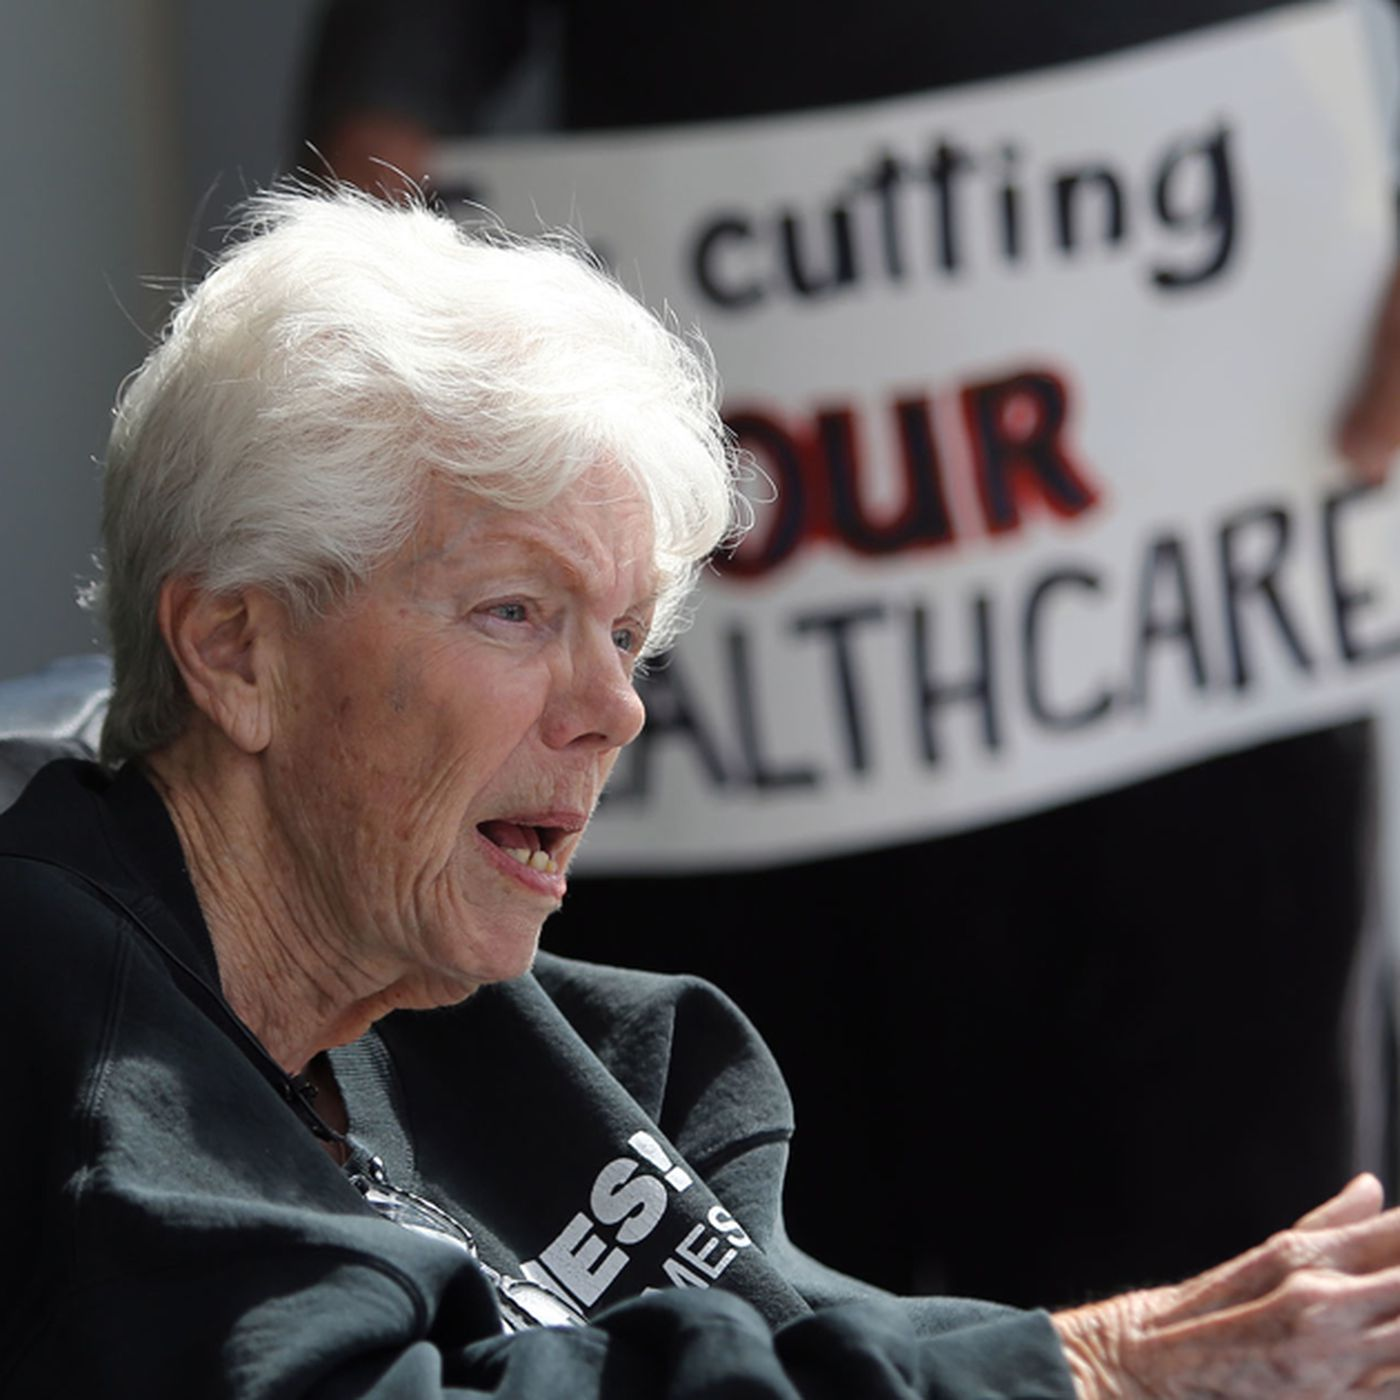 Barbara Toomer speaking at rally